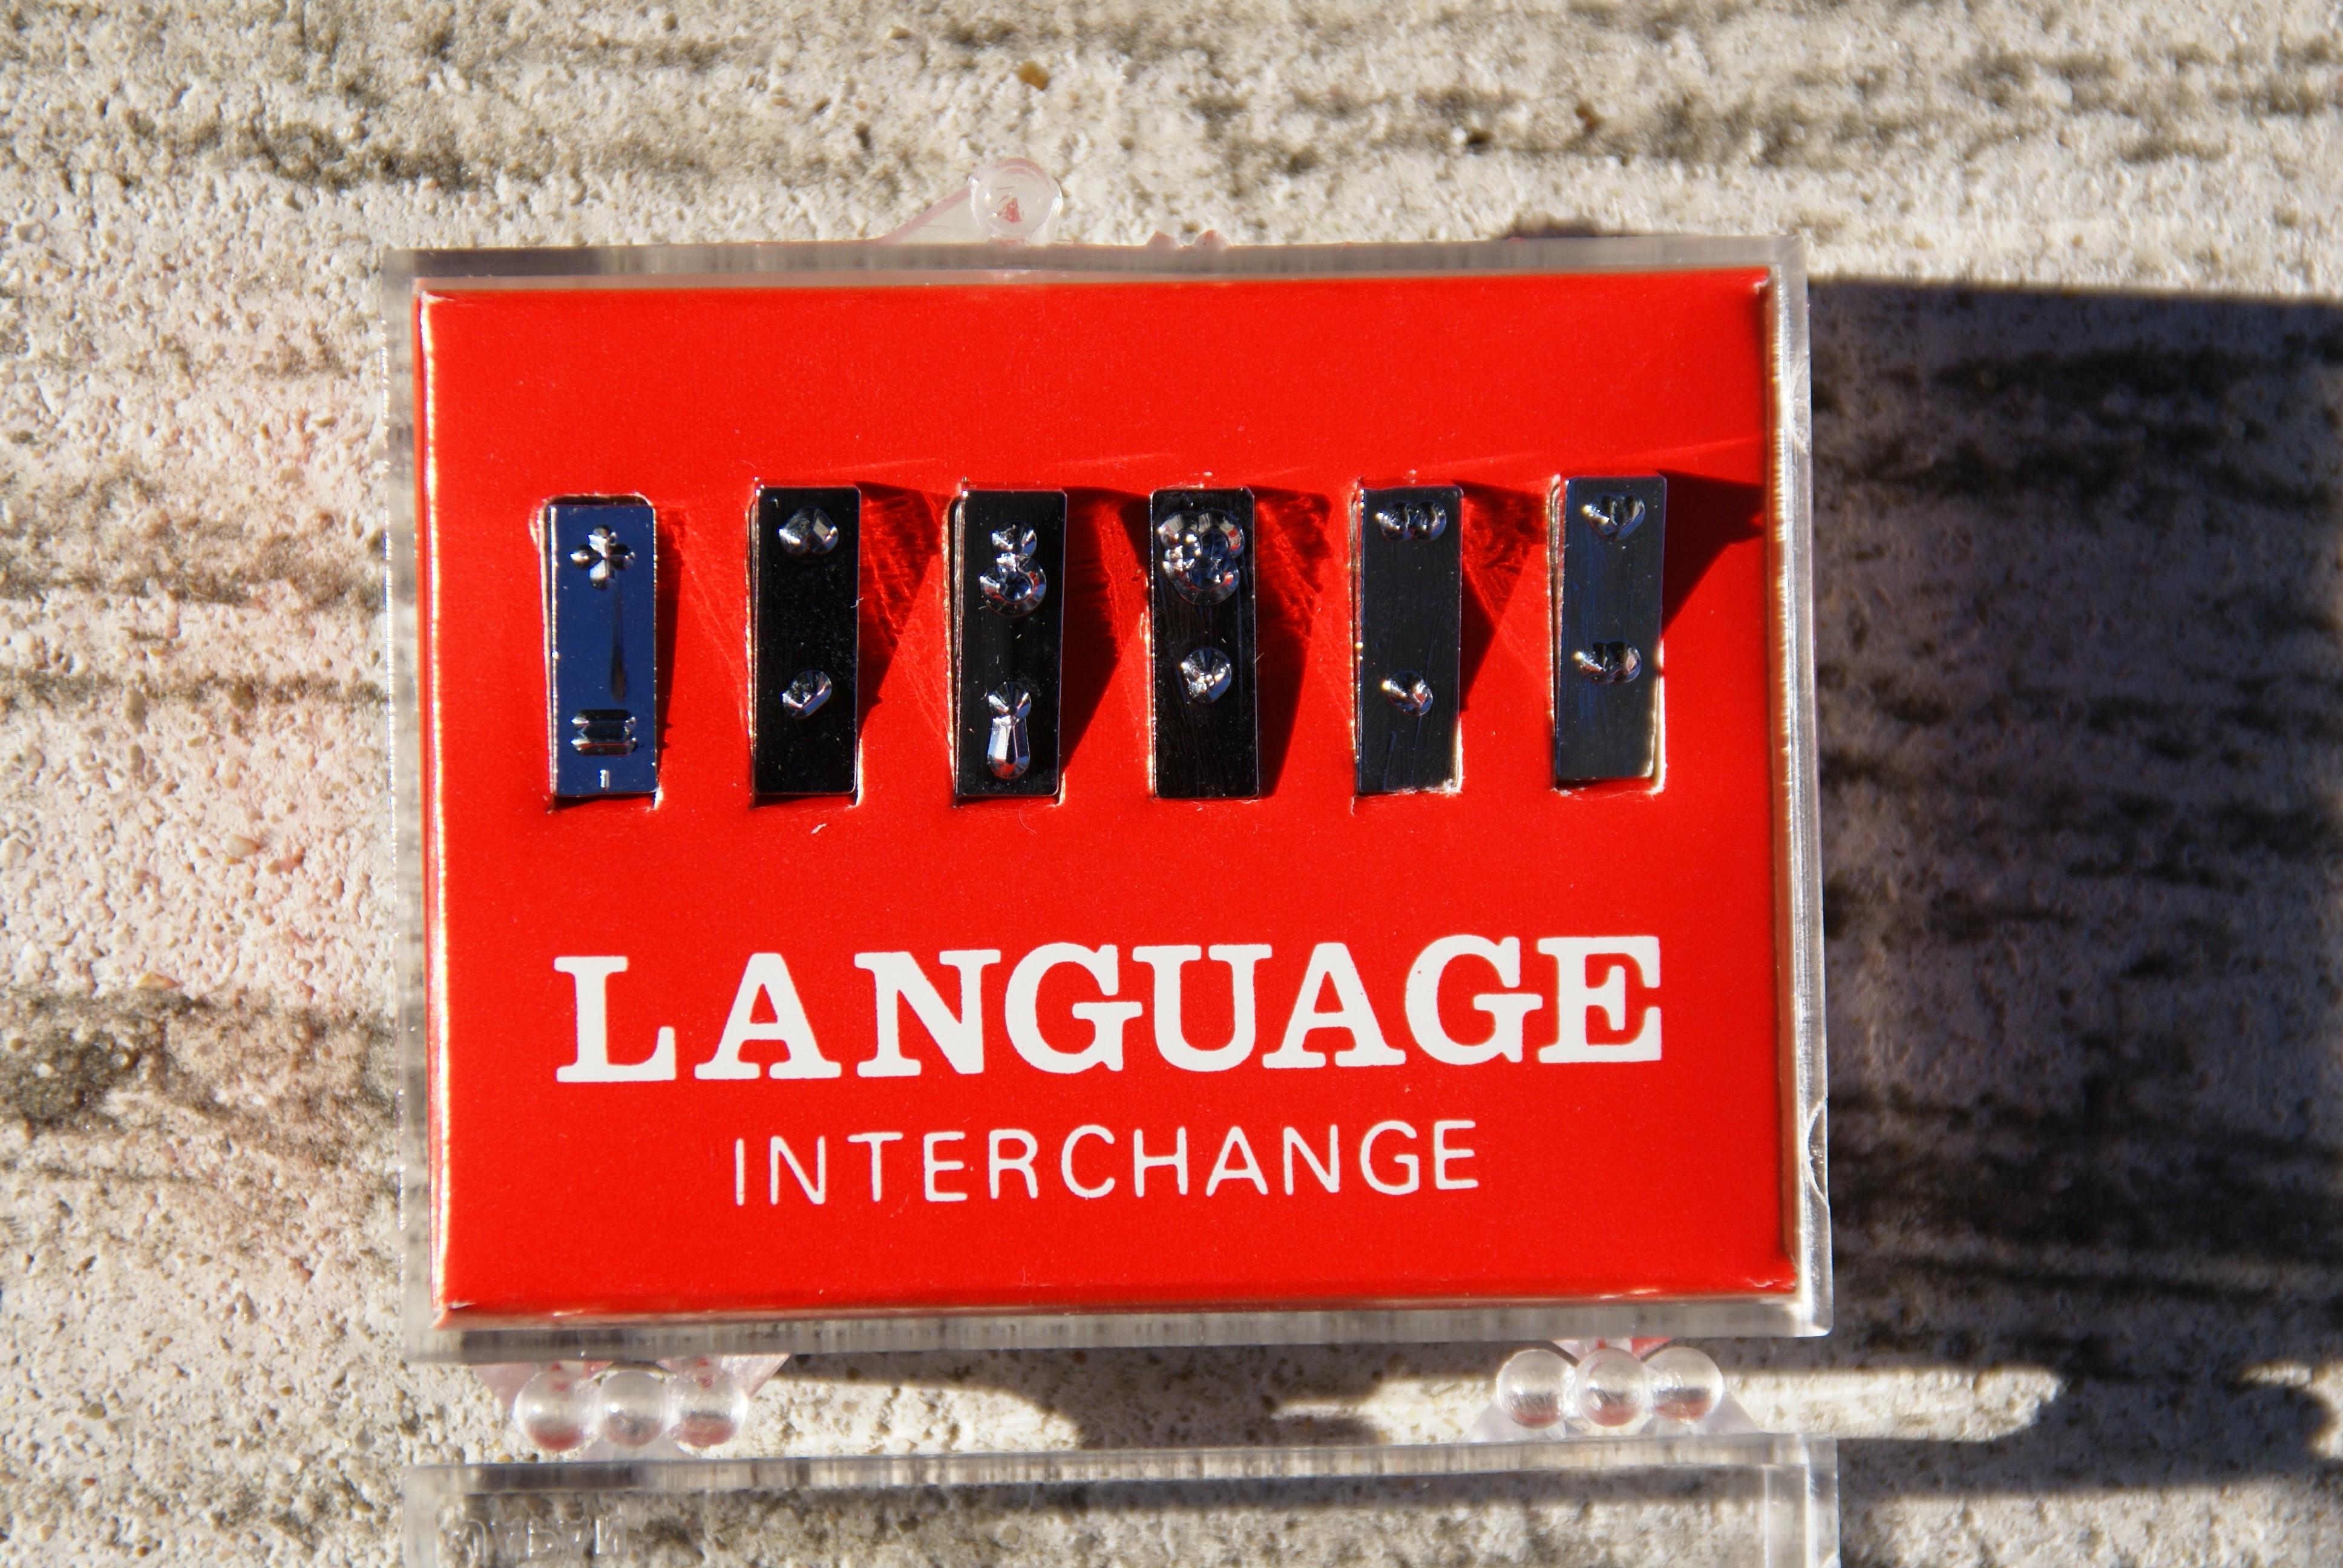 Top Tips to Make a Language Interchange Work